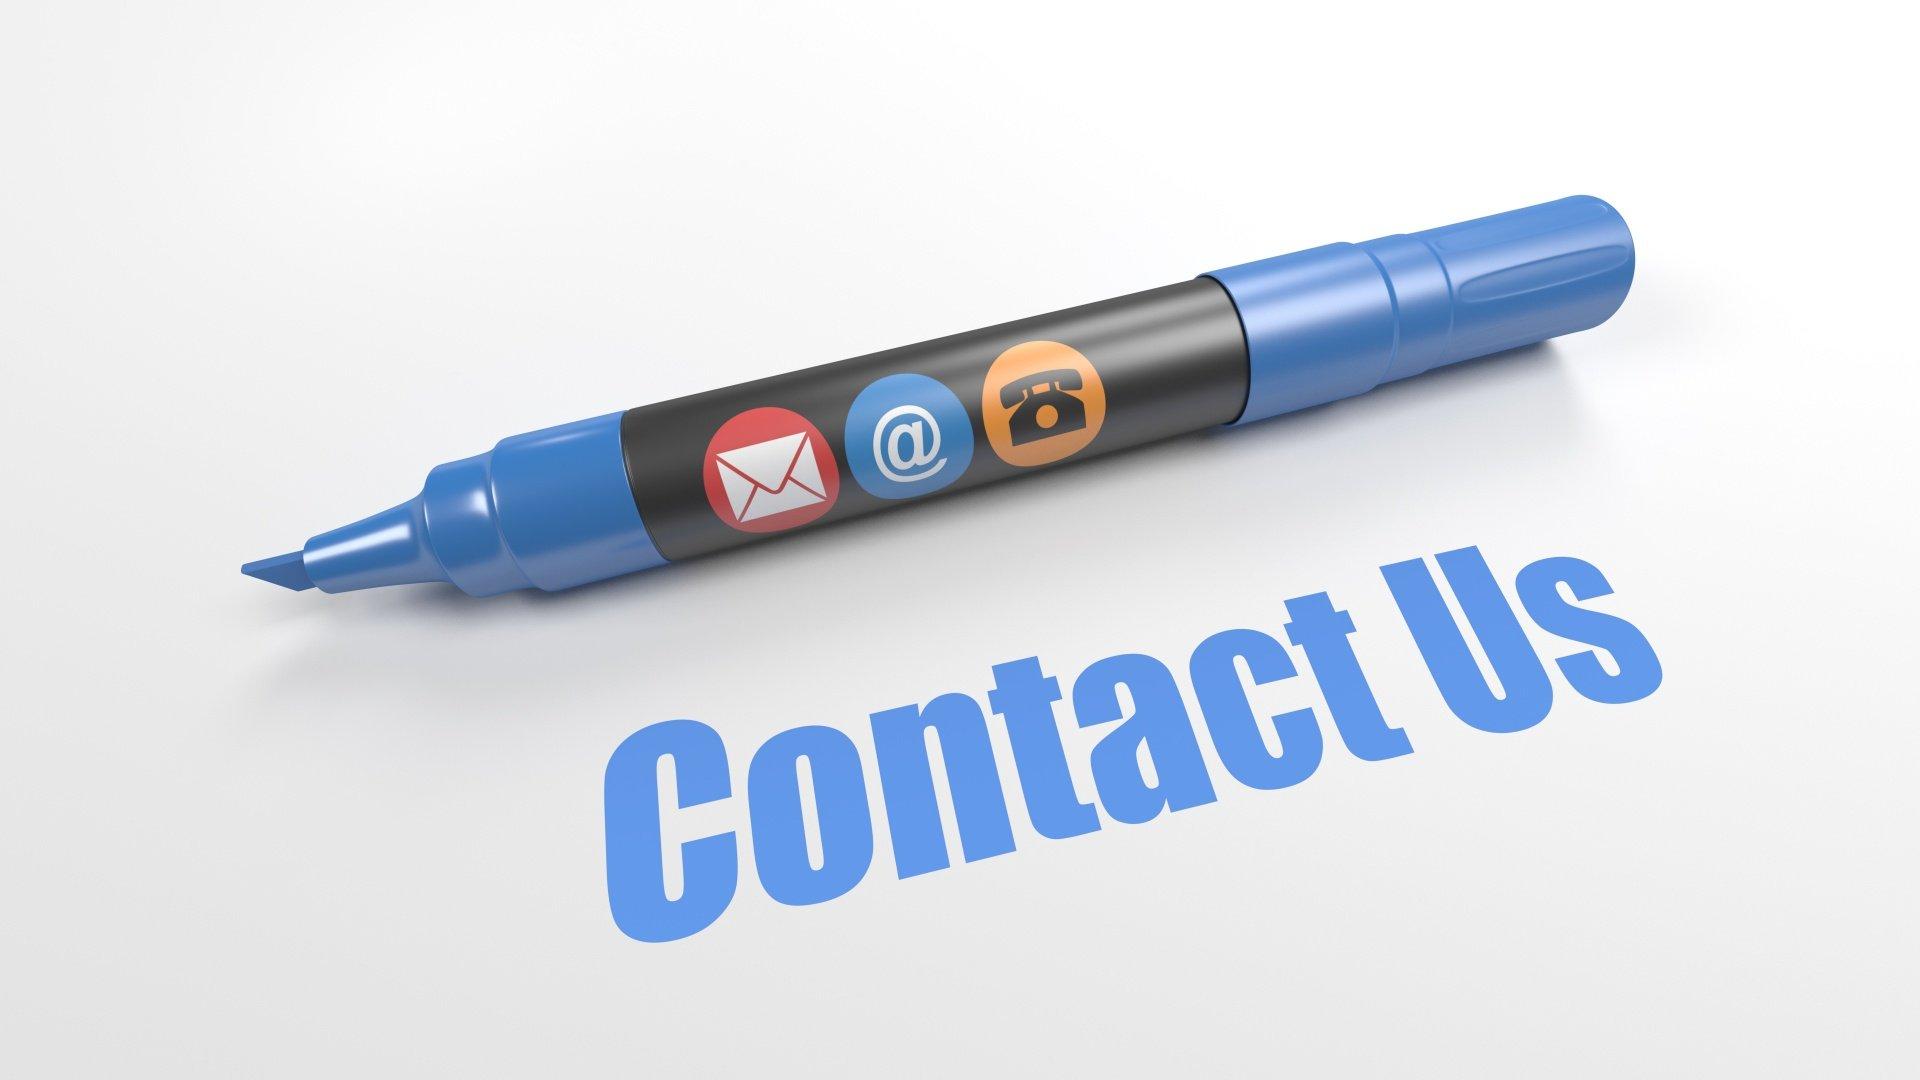 Call Centres in Mumbai & BPO companies in navi Mumbai